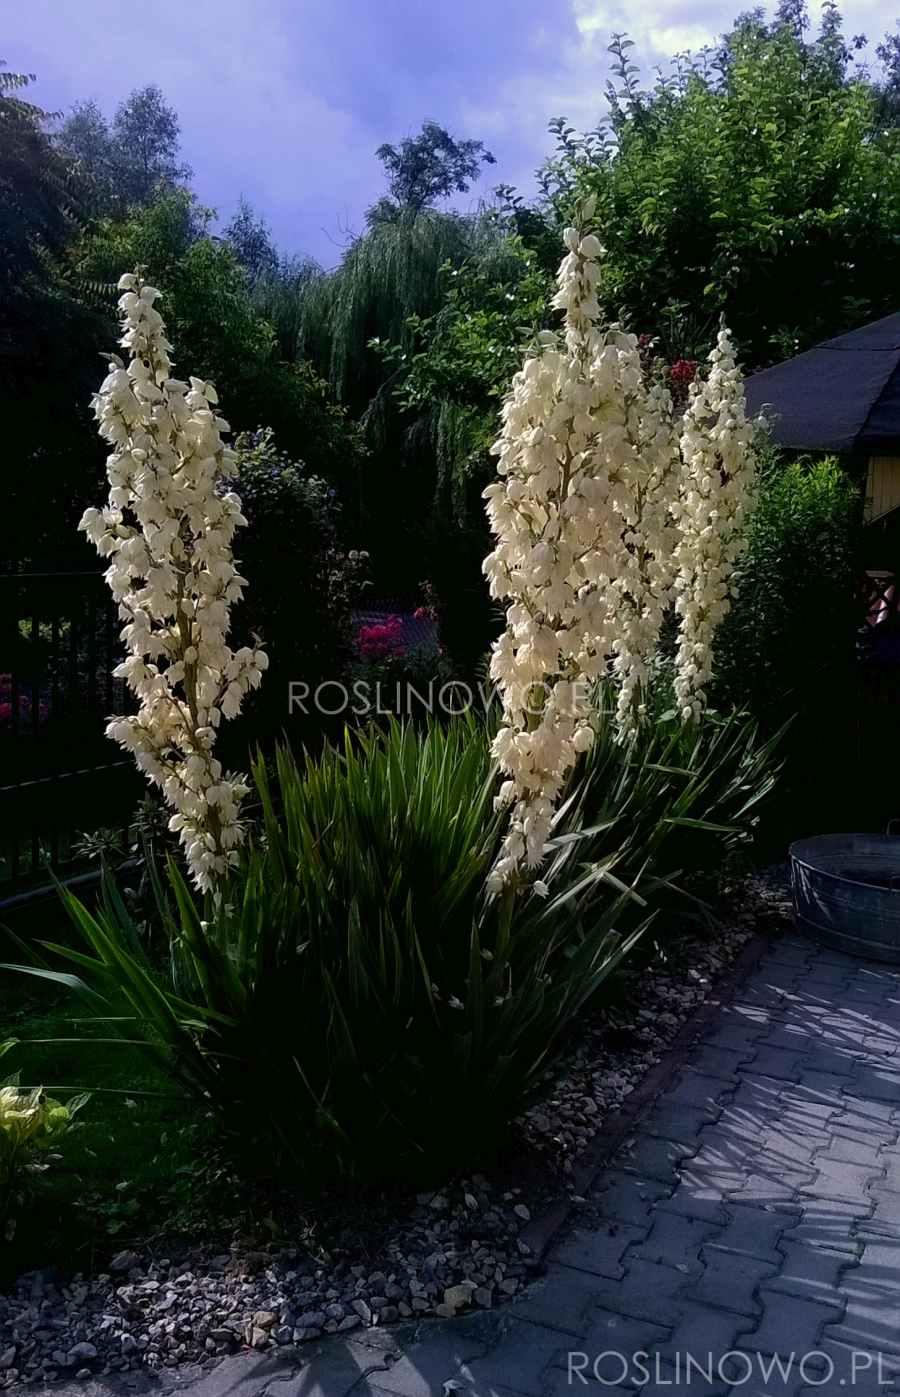 juka karolińska - roślina tropikalna na rabtay słoneczne i skalne